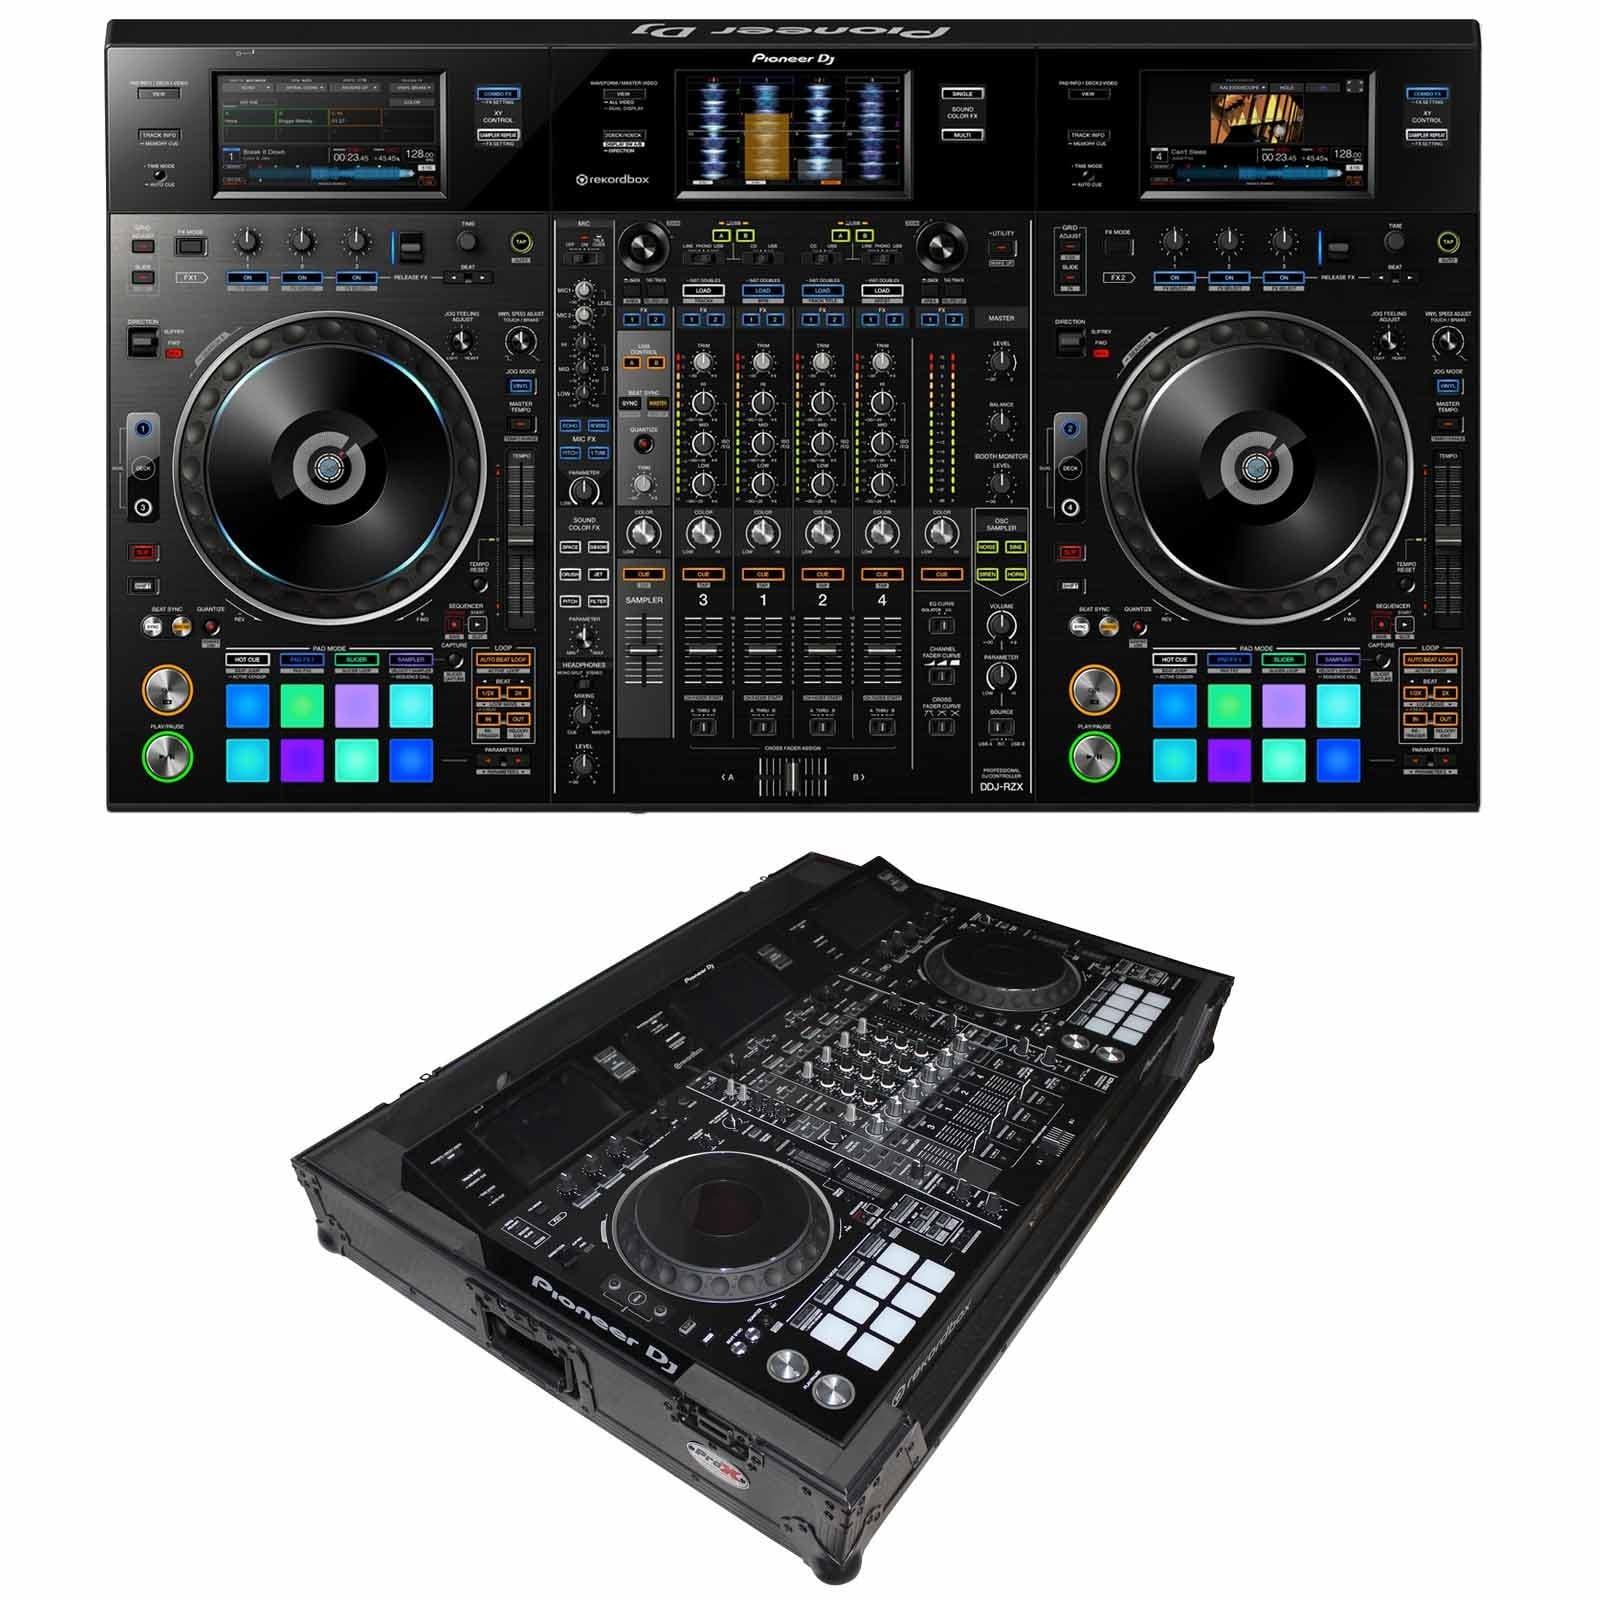 pioneer-ddj-rzx-professional-4-channel-controller-for-rekordbox-dj-rekordbox-v.jpg